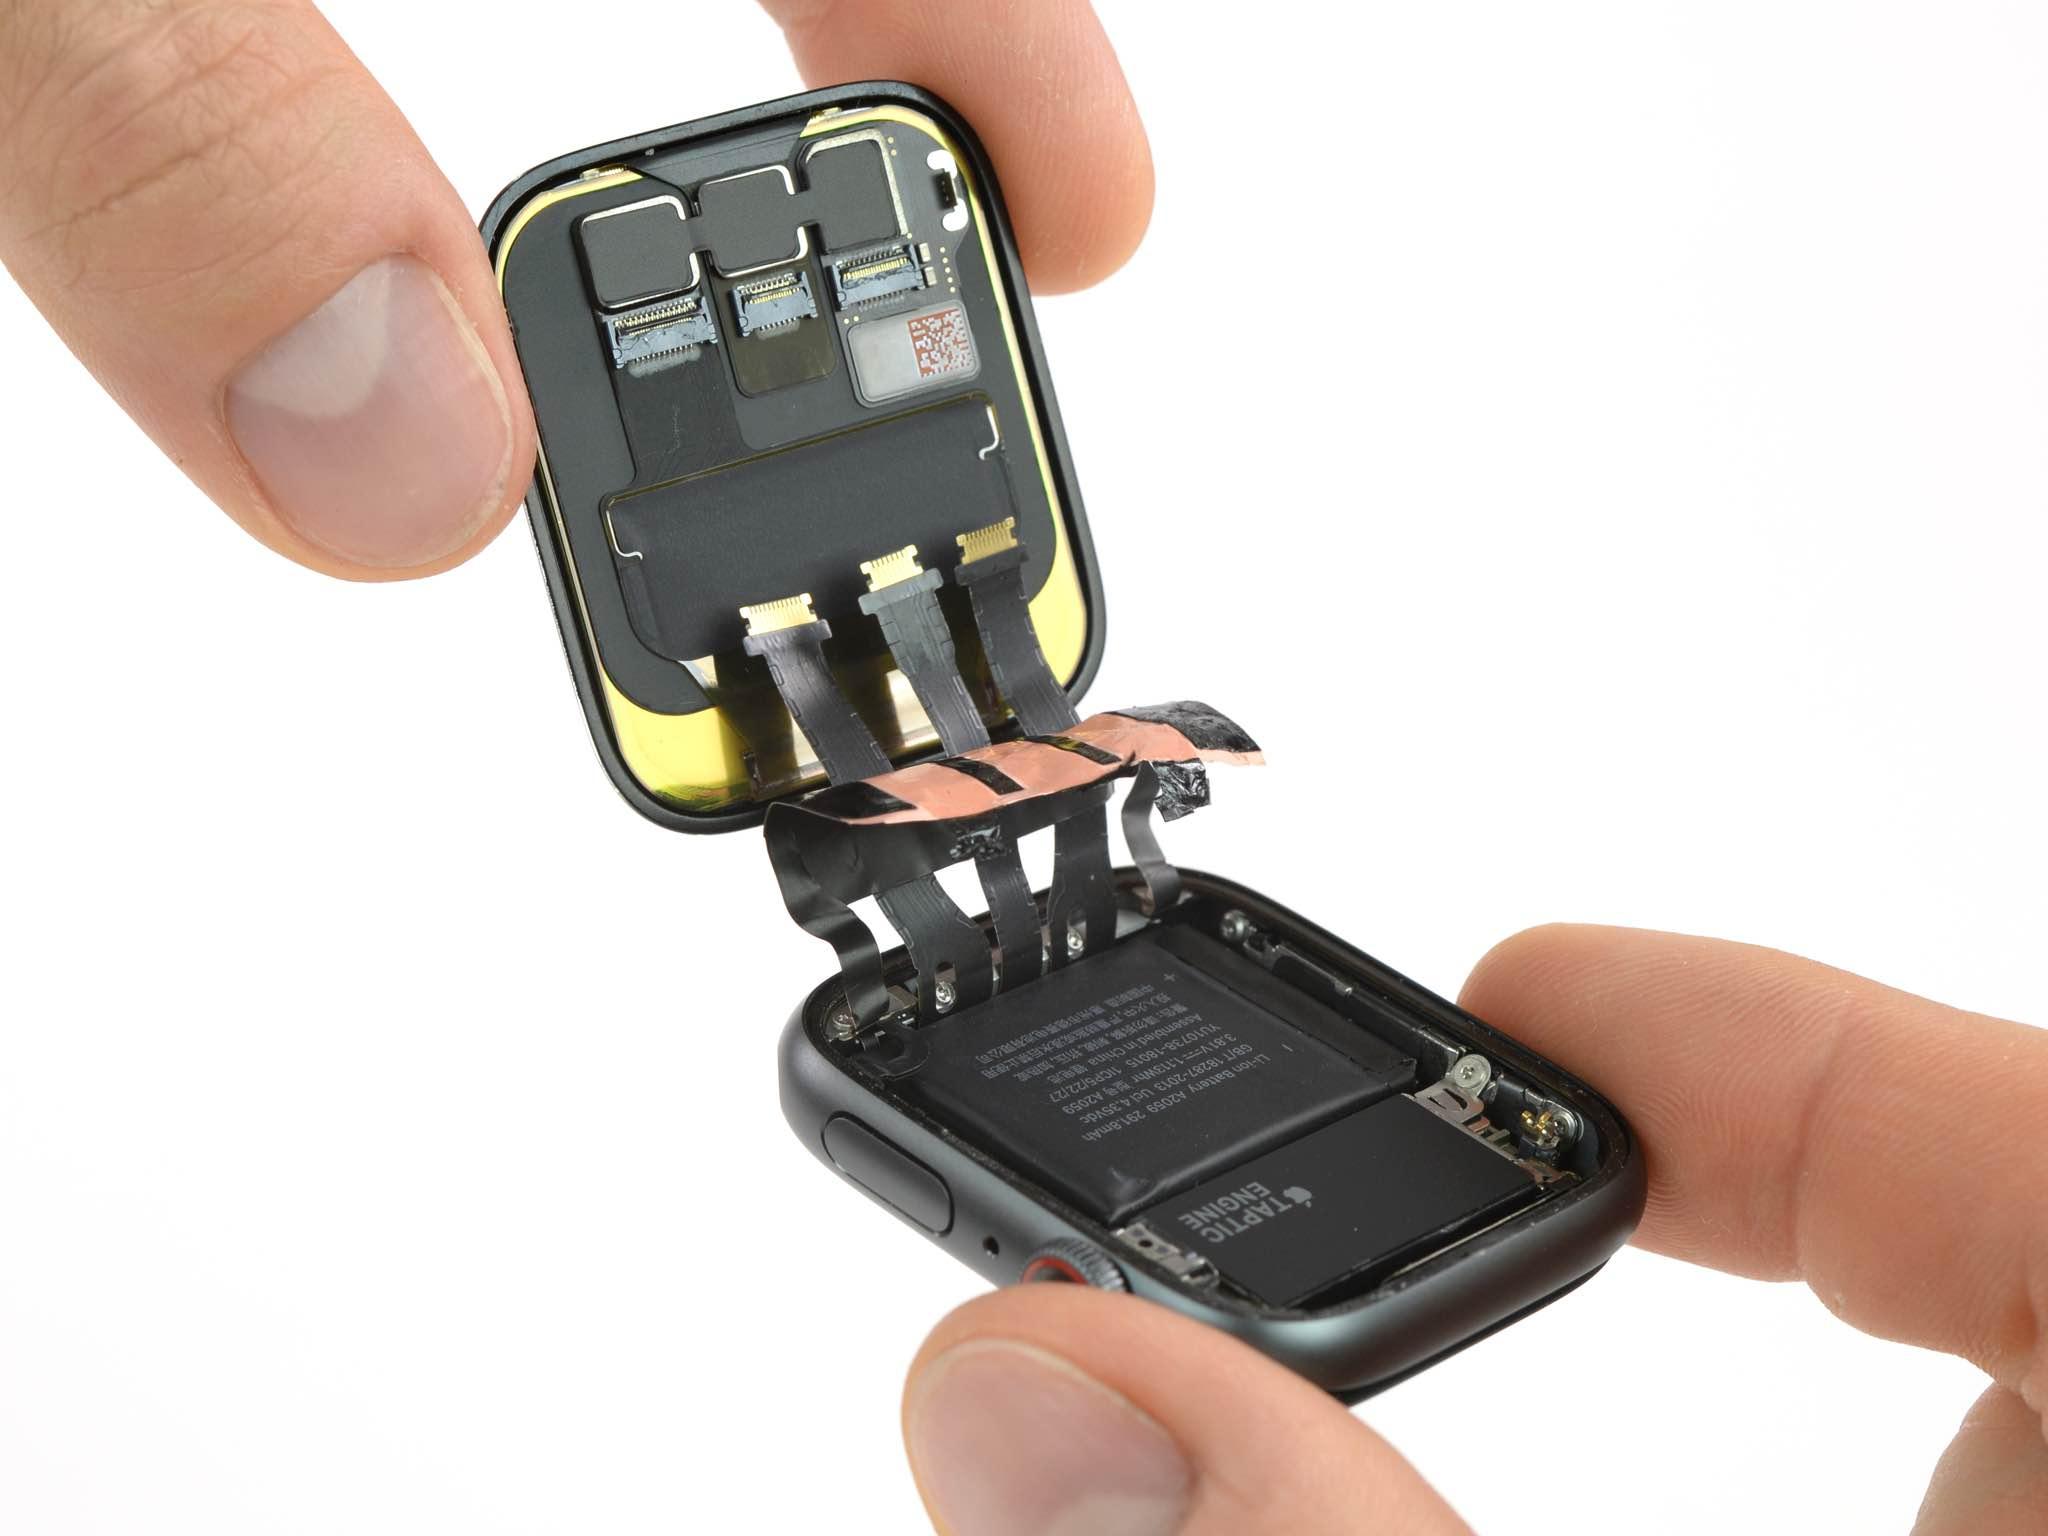 Apple Watch Series 4 teardown reveals a longer Taptic Engine than before